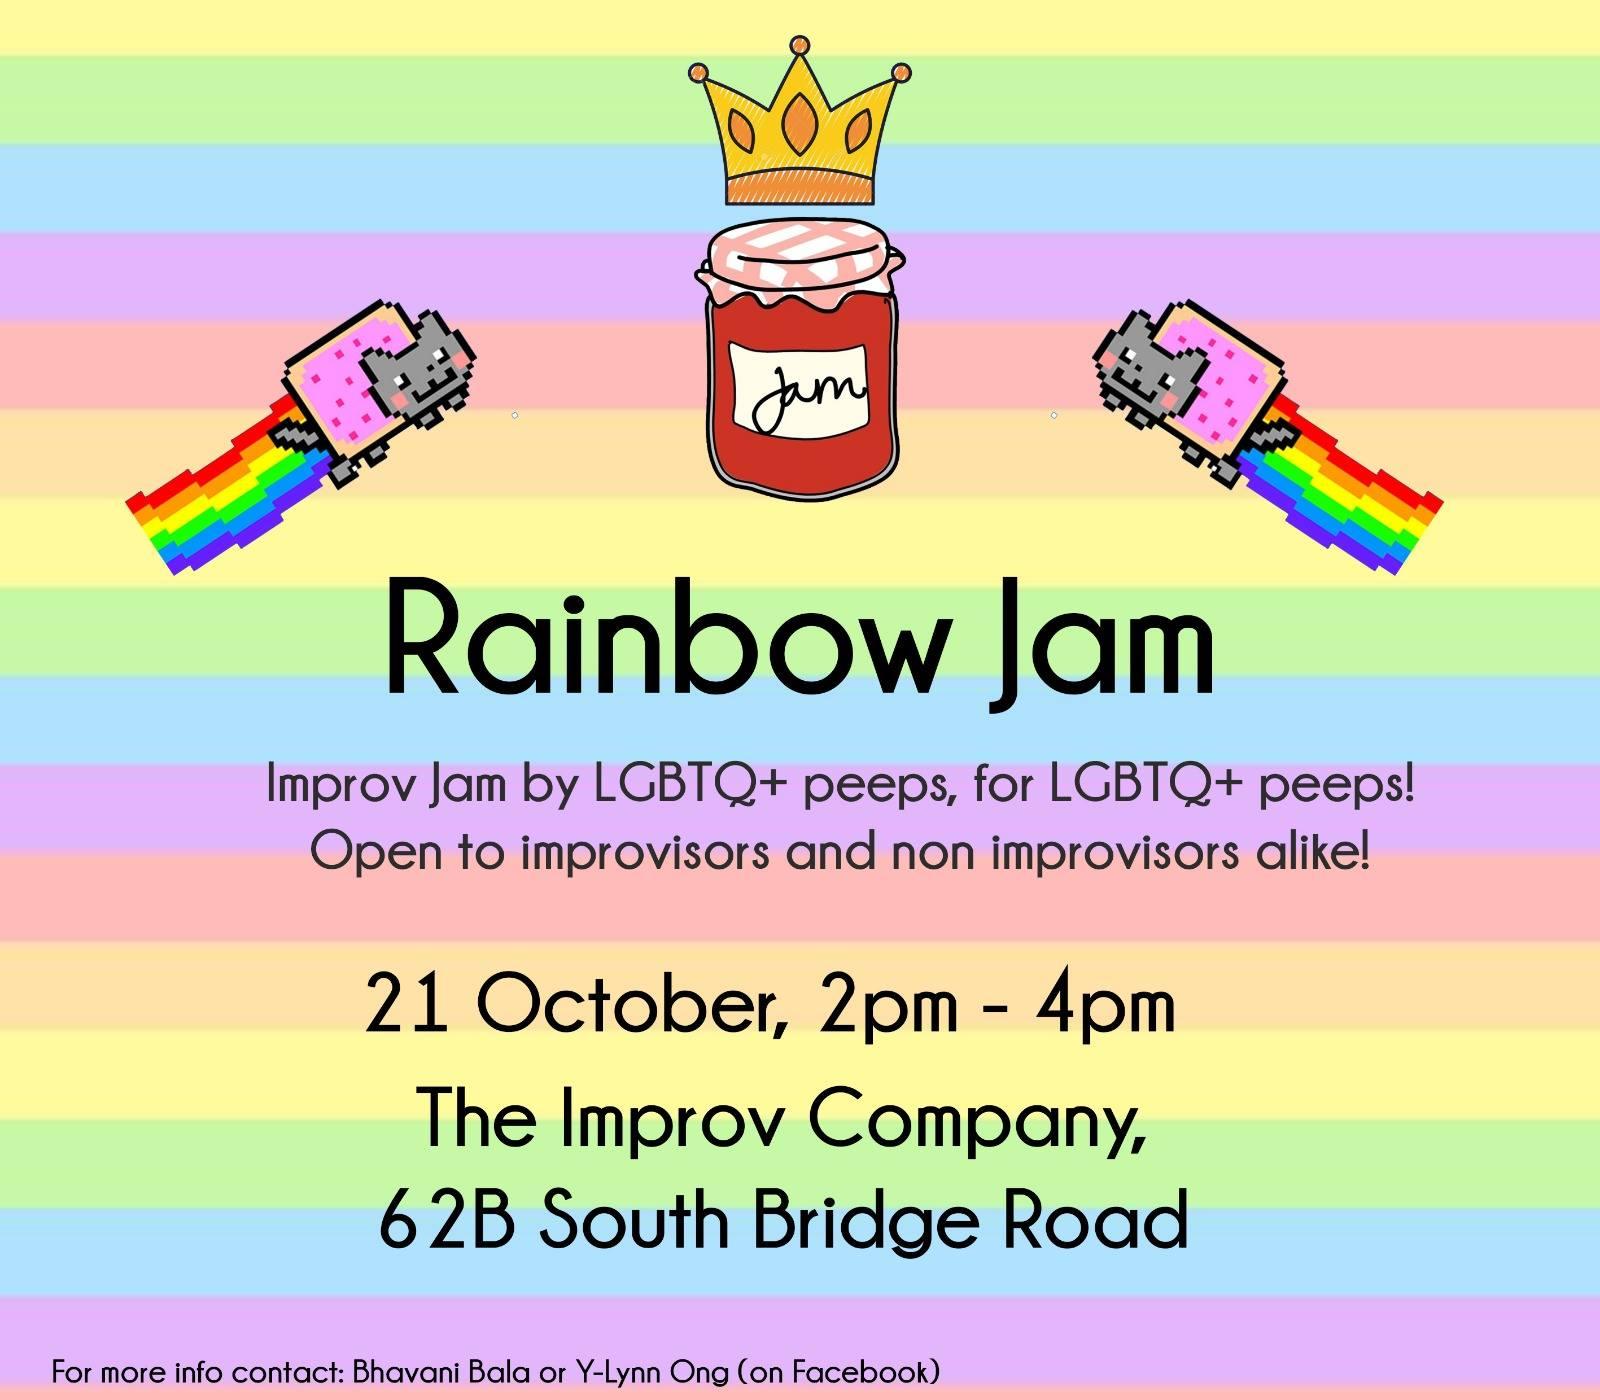 LGBTQ IMprov